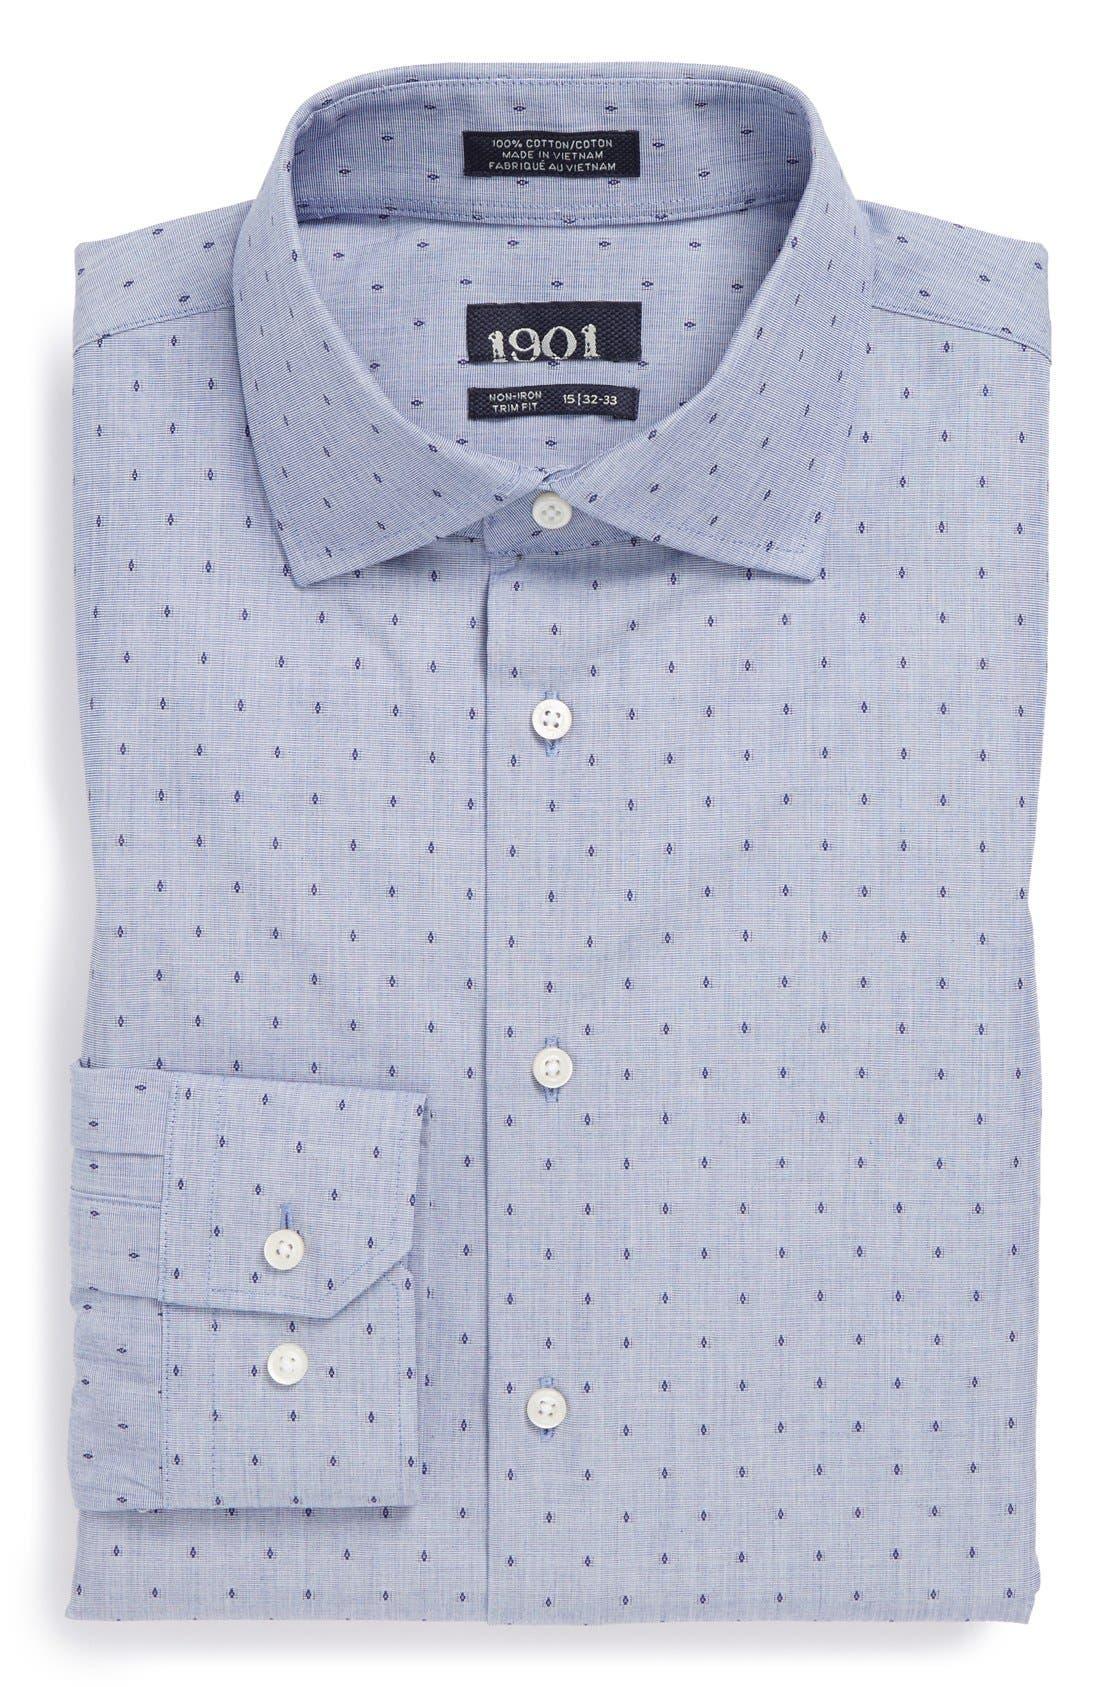 1901 Non-Iron Trim Fit Dobby Dress Shirt, Main, color, 450